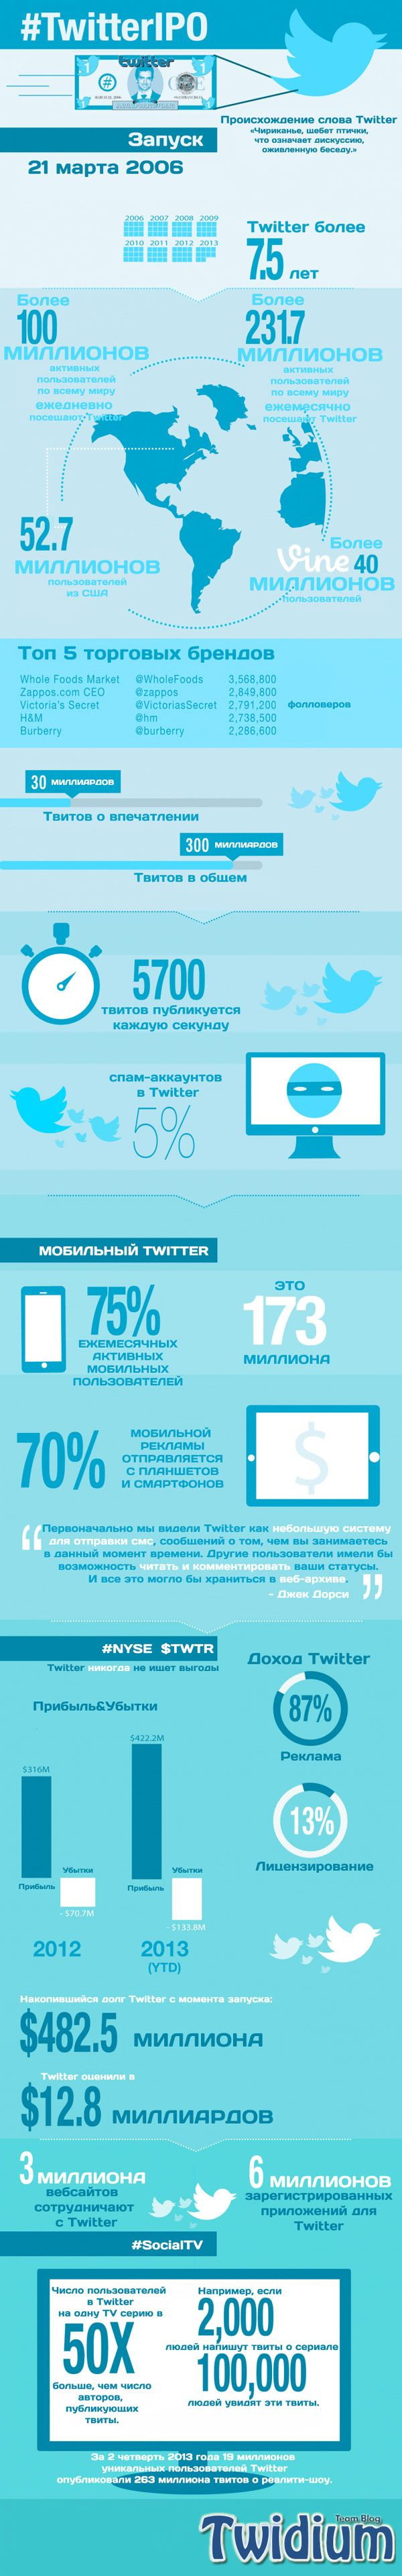 Какое «хозяйство» досталось владельцам акций #Twitter после IPO?